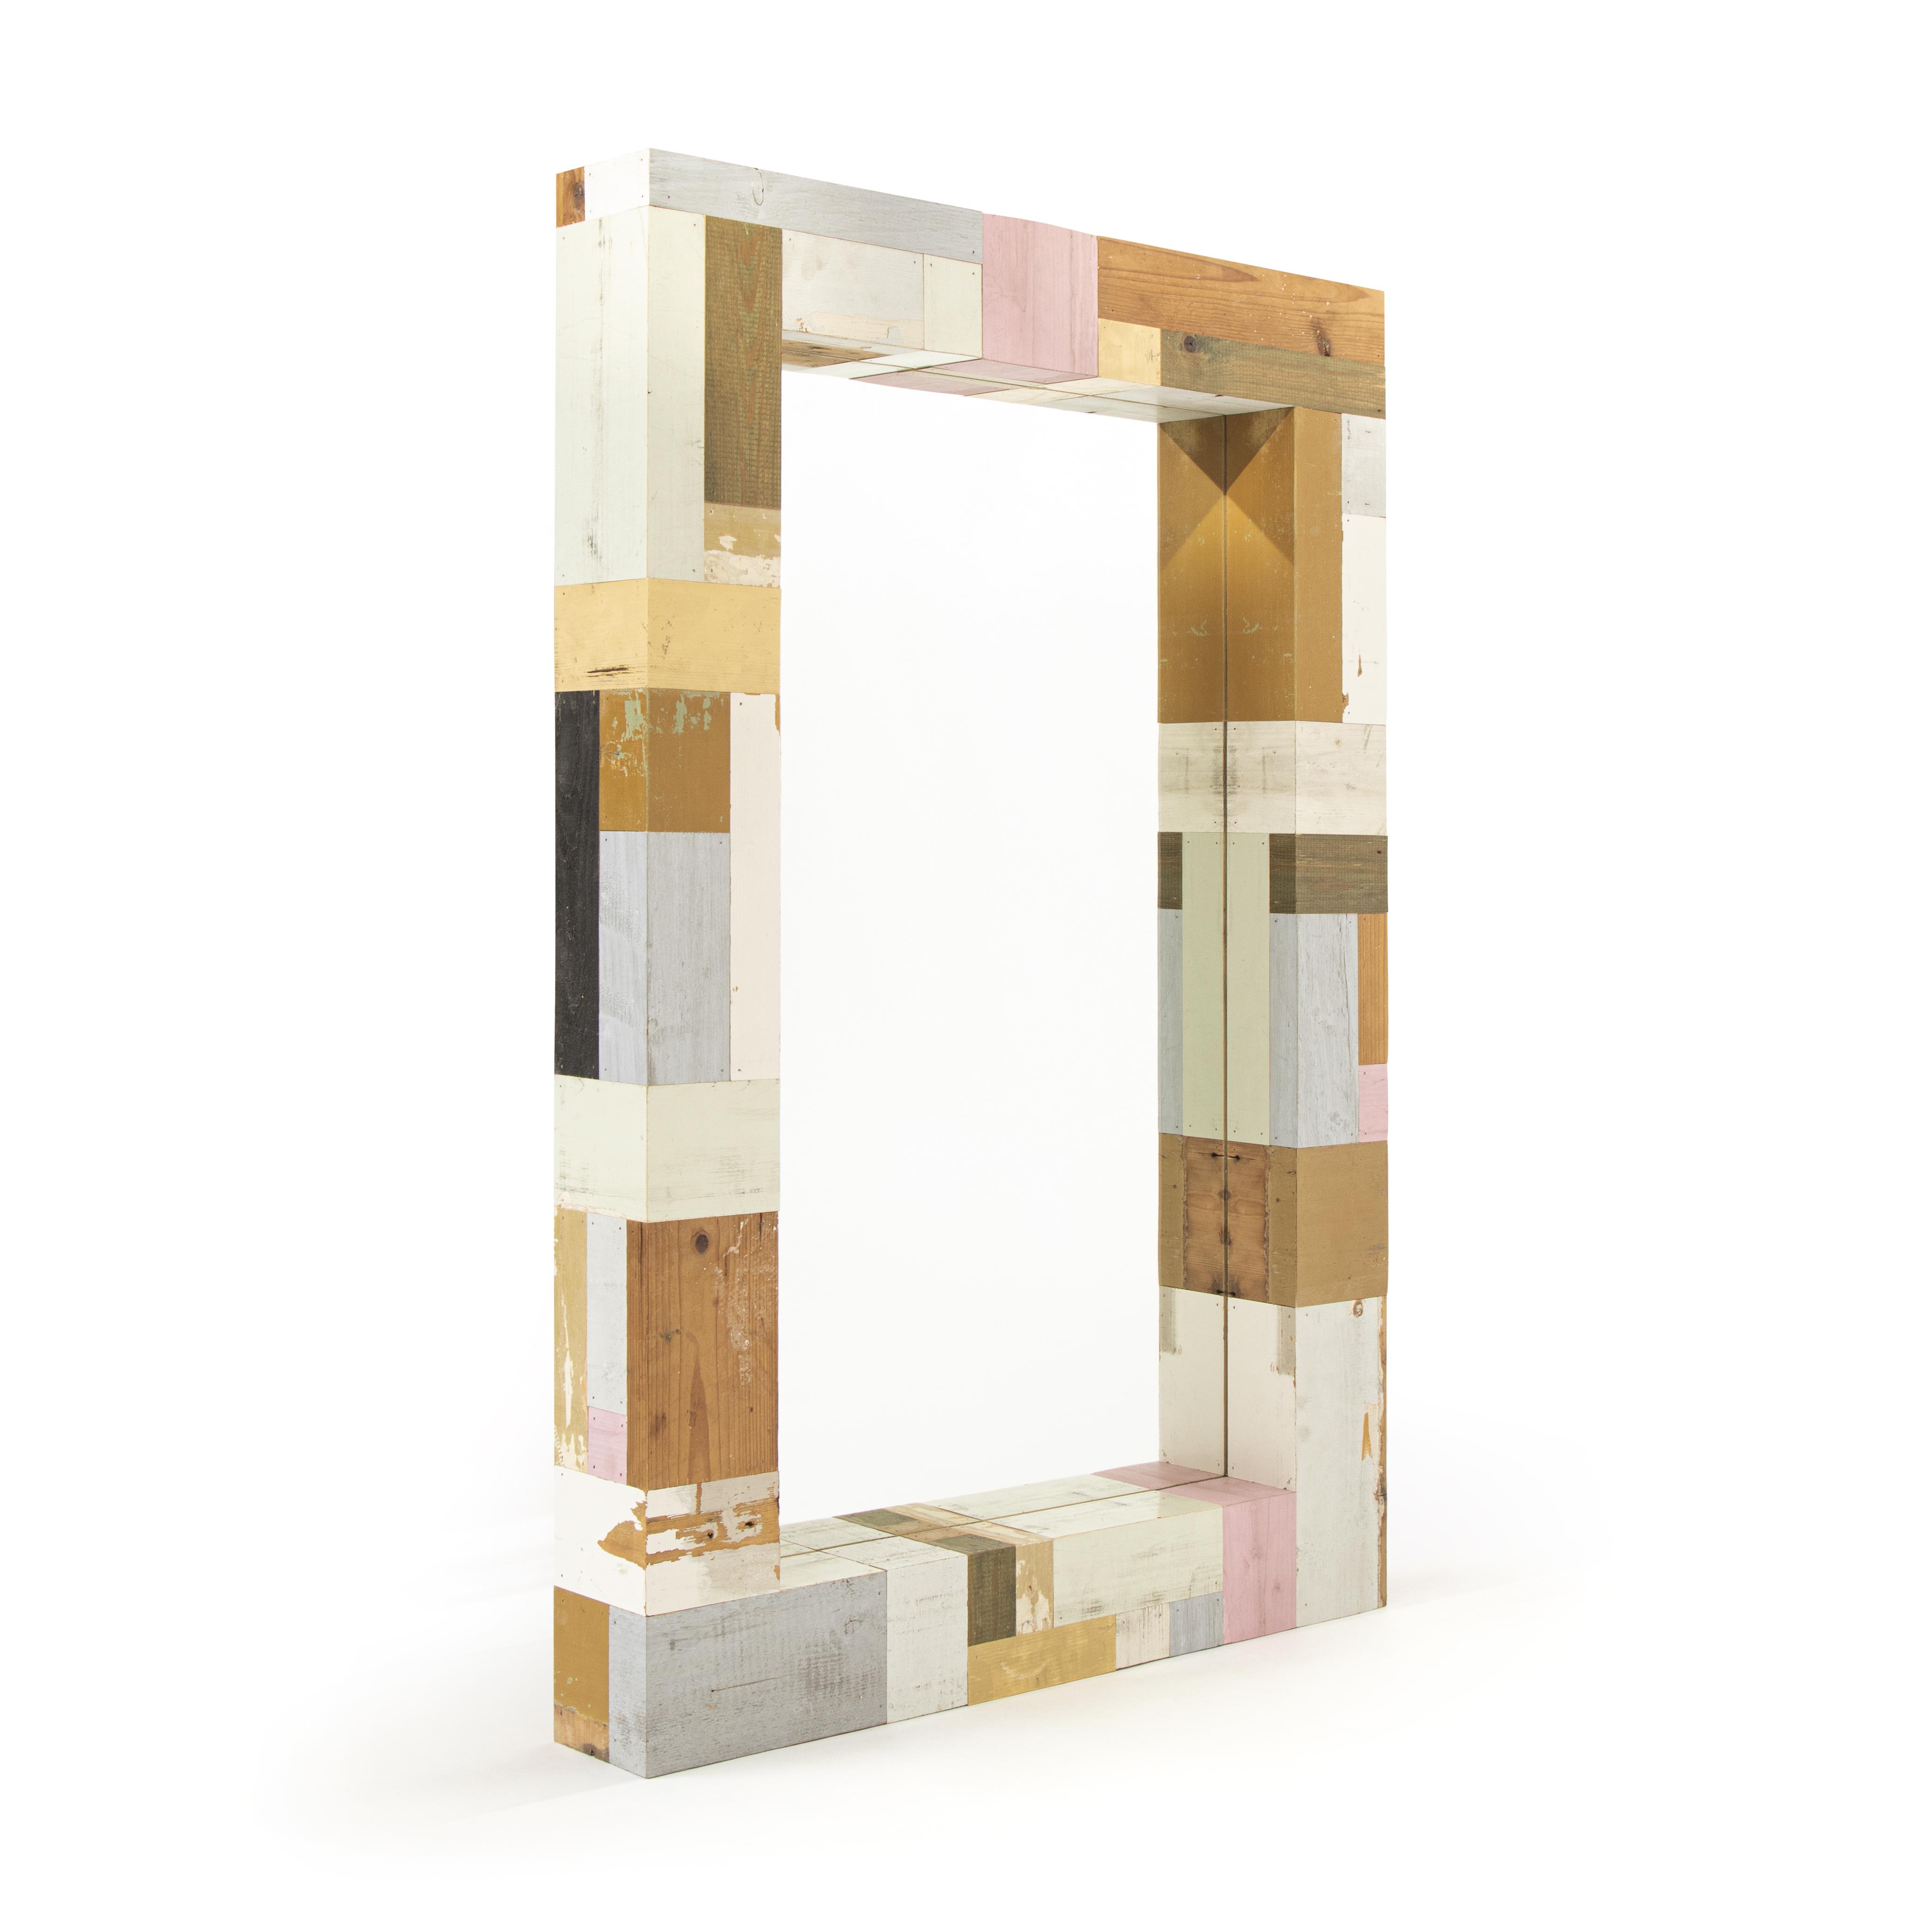 02_Waste_mirror_in_scrapwood_nr2_perspective_THUMBNAIL-1